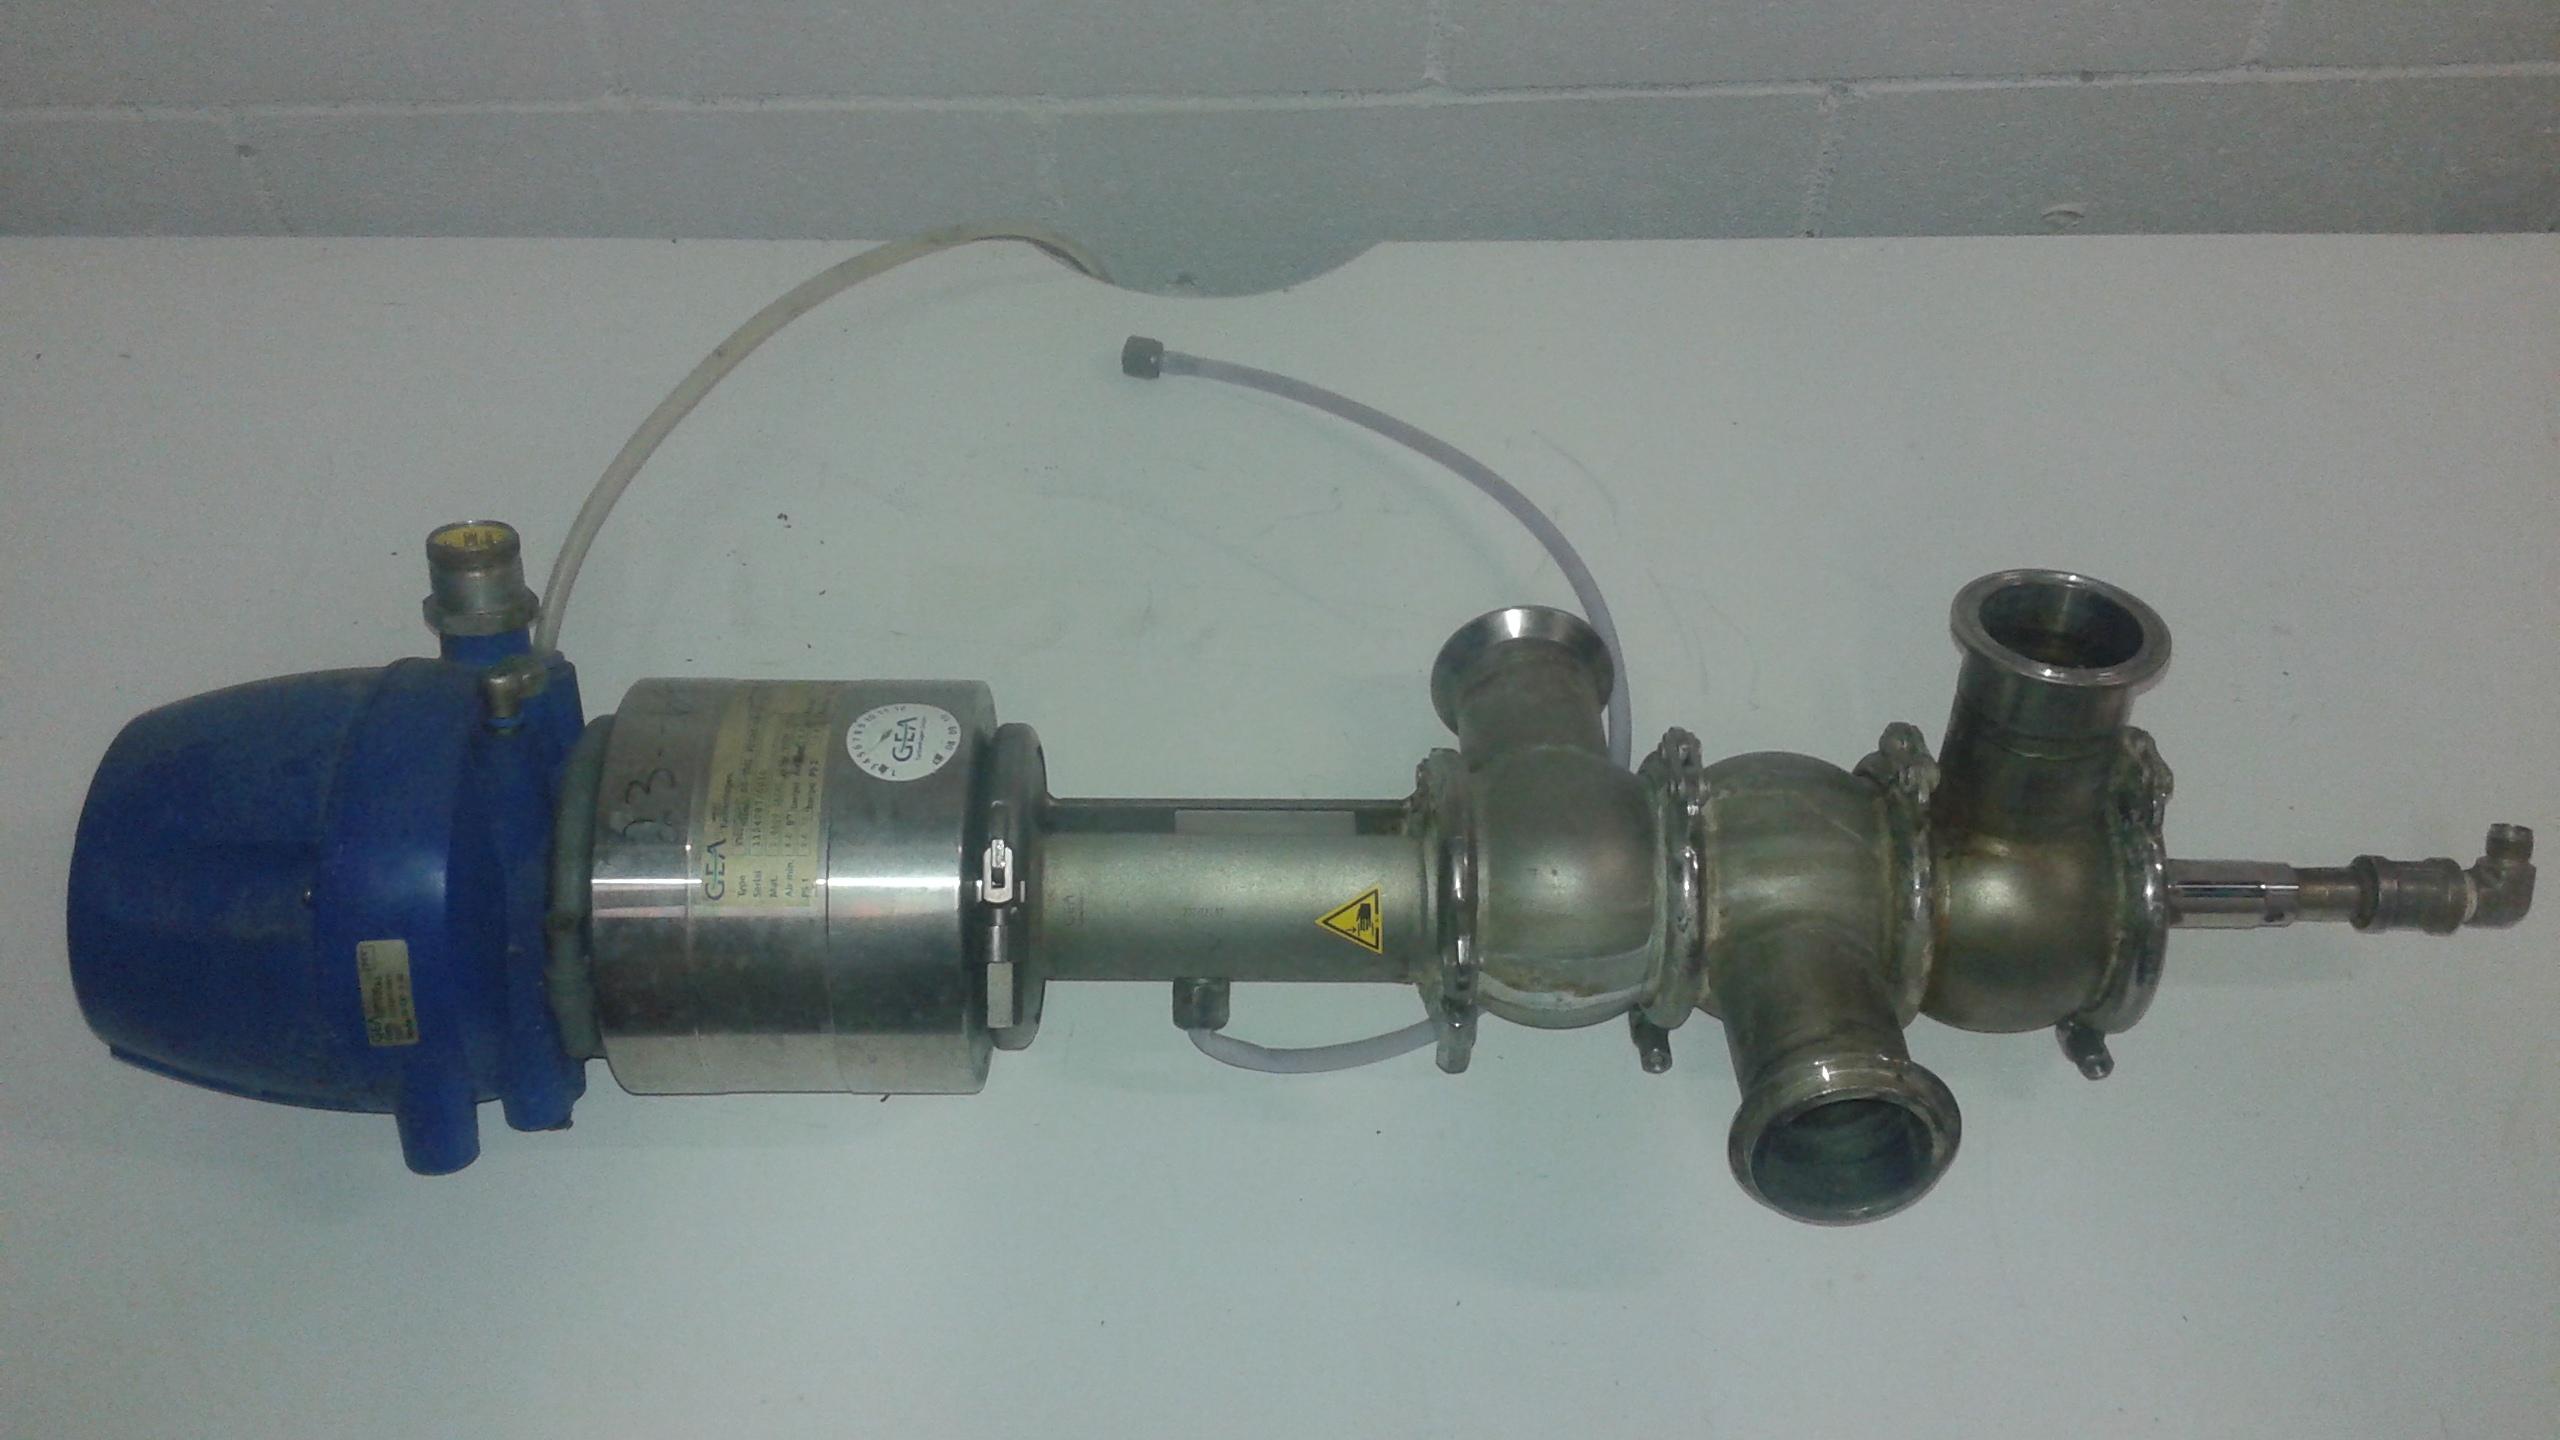 GEA 2 inch valve 316 stainless steel - LOCATION - LONDON, ONTARIO